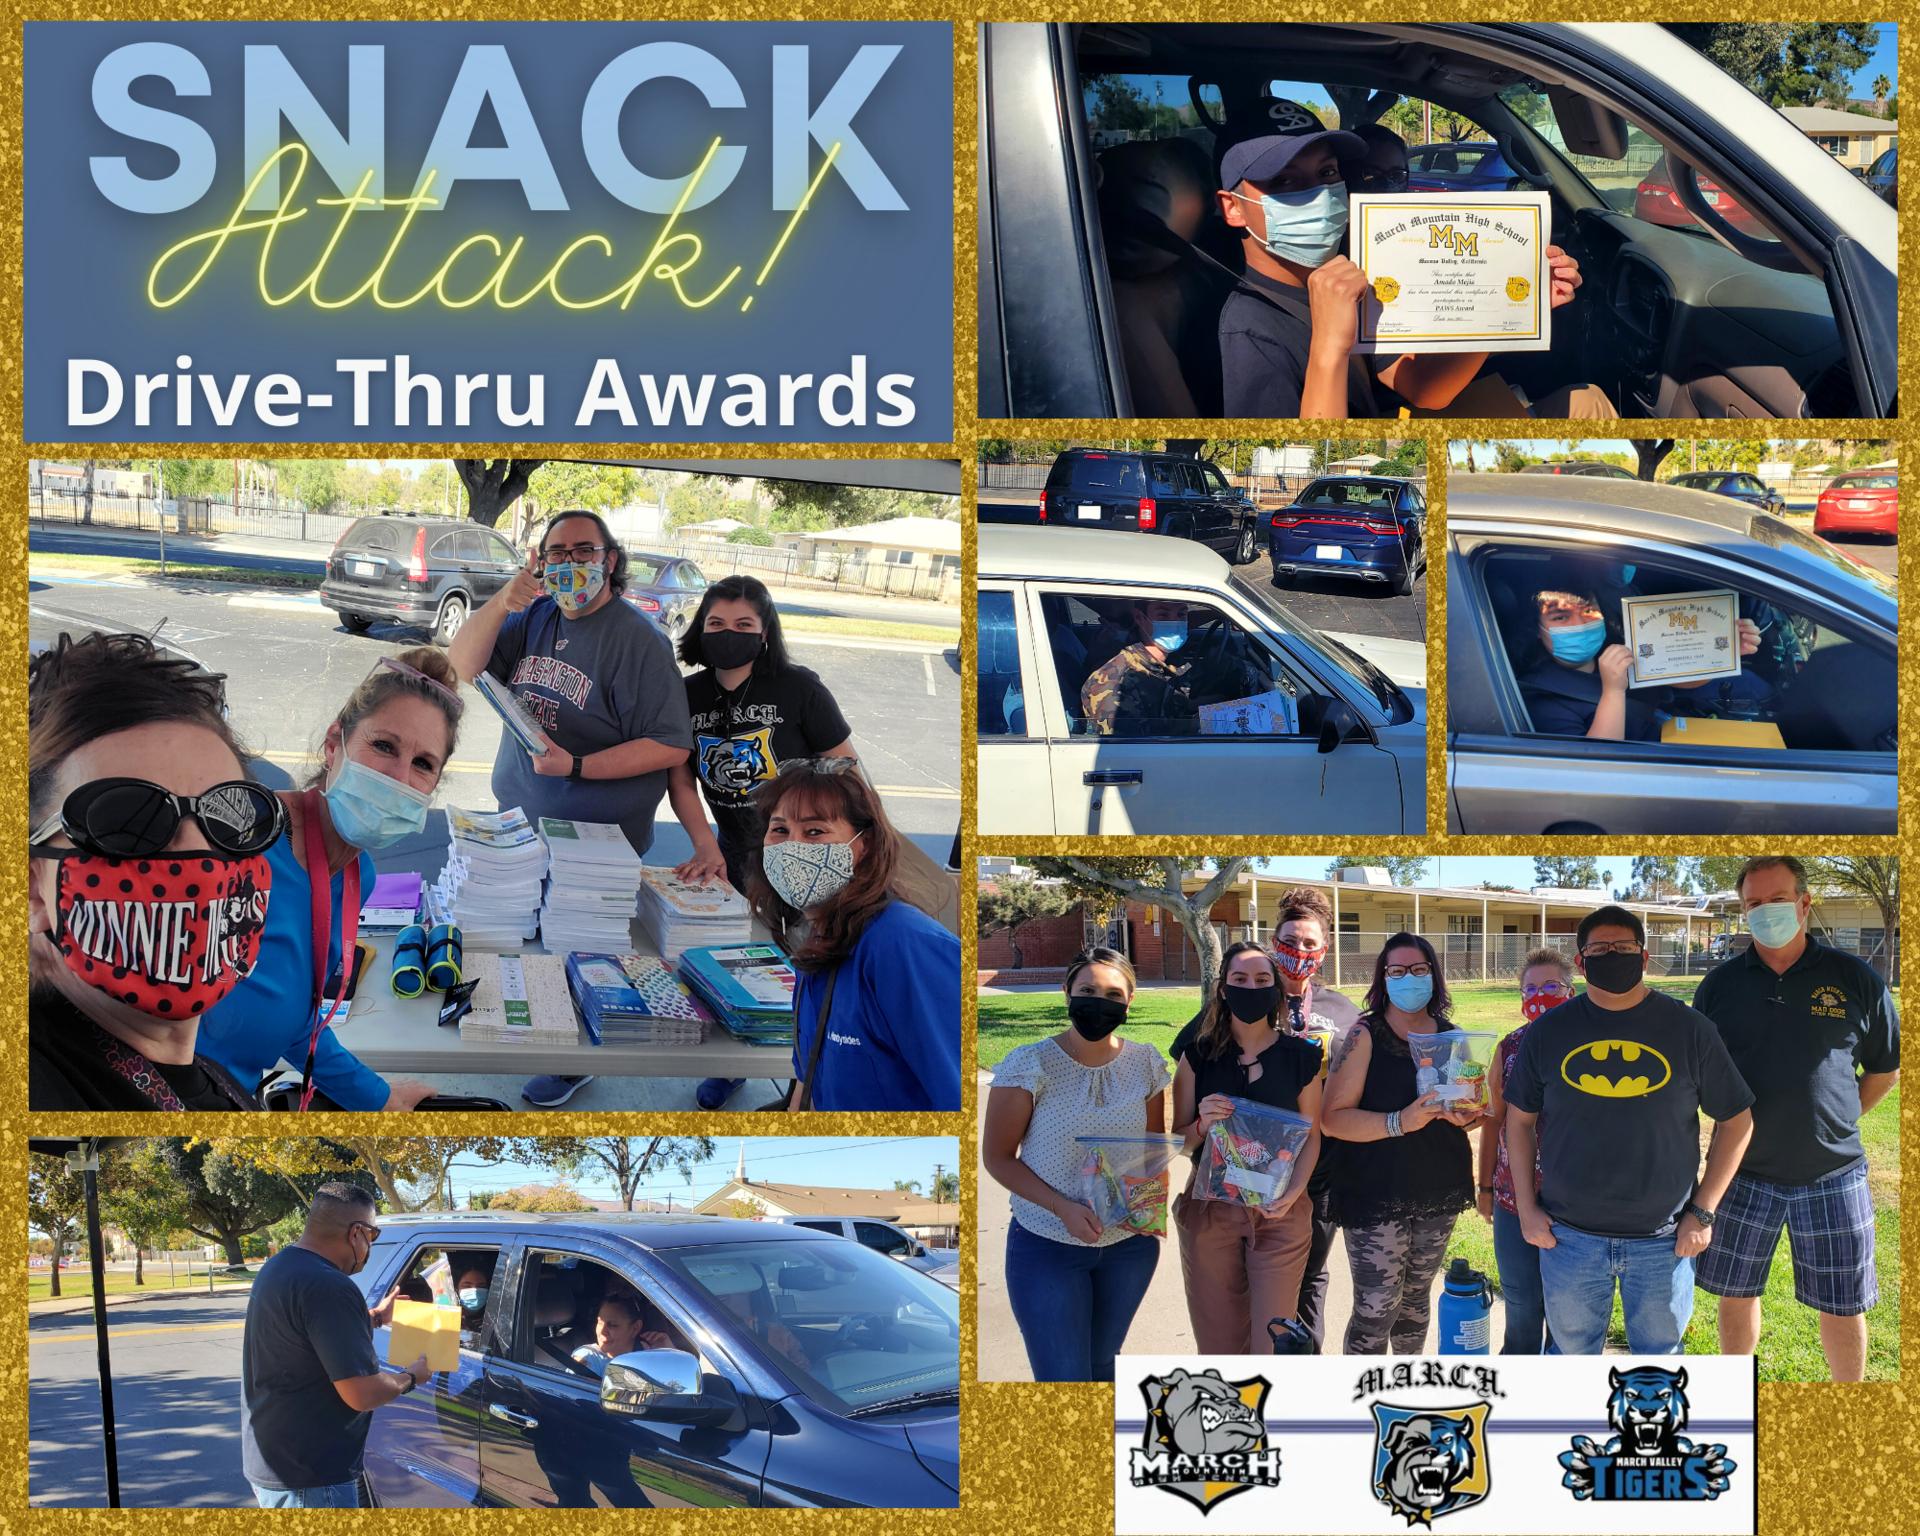 Snack Attack Drive-Thru Awards